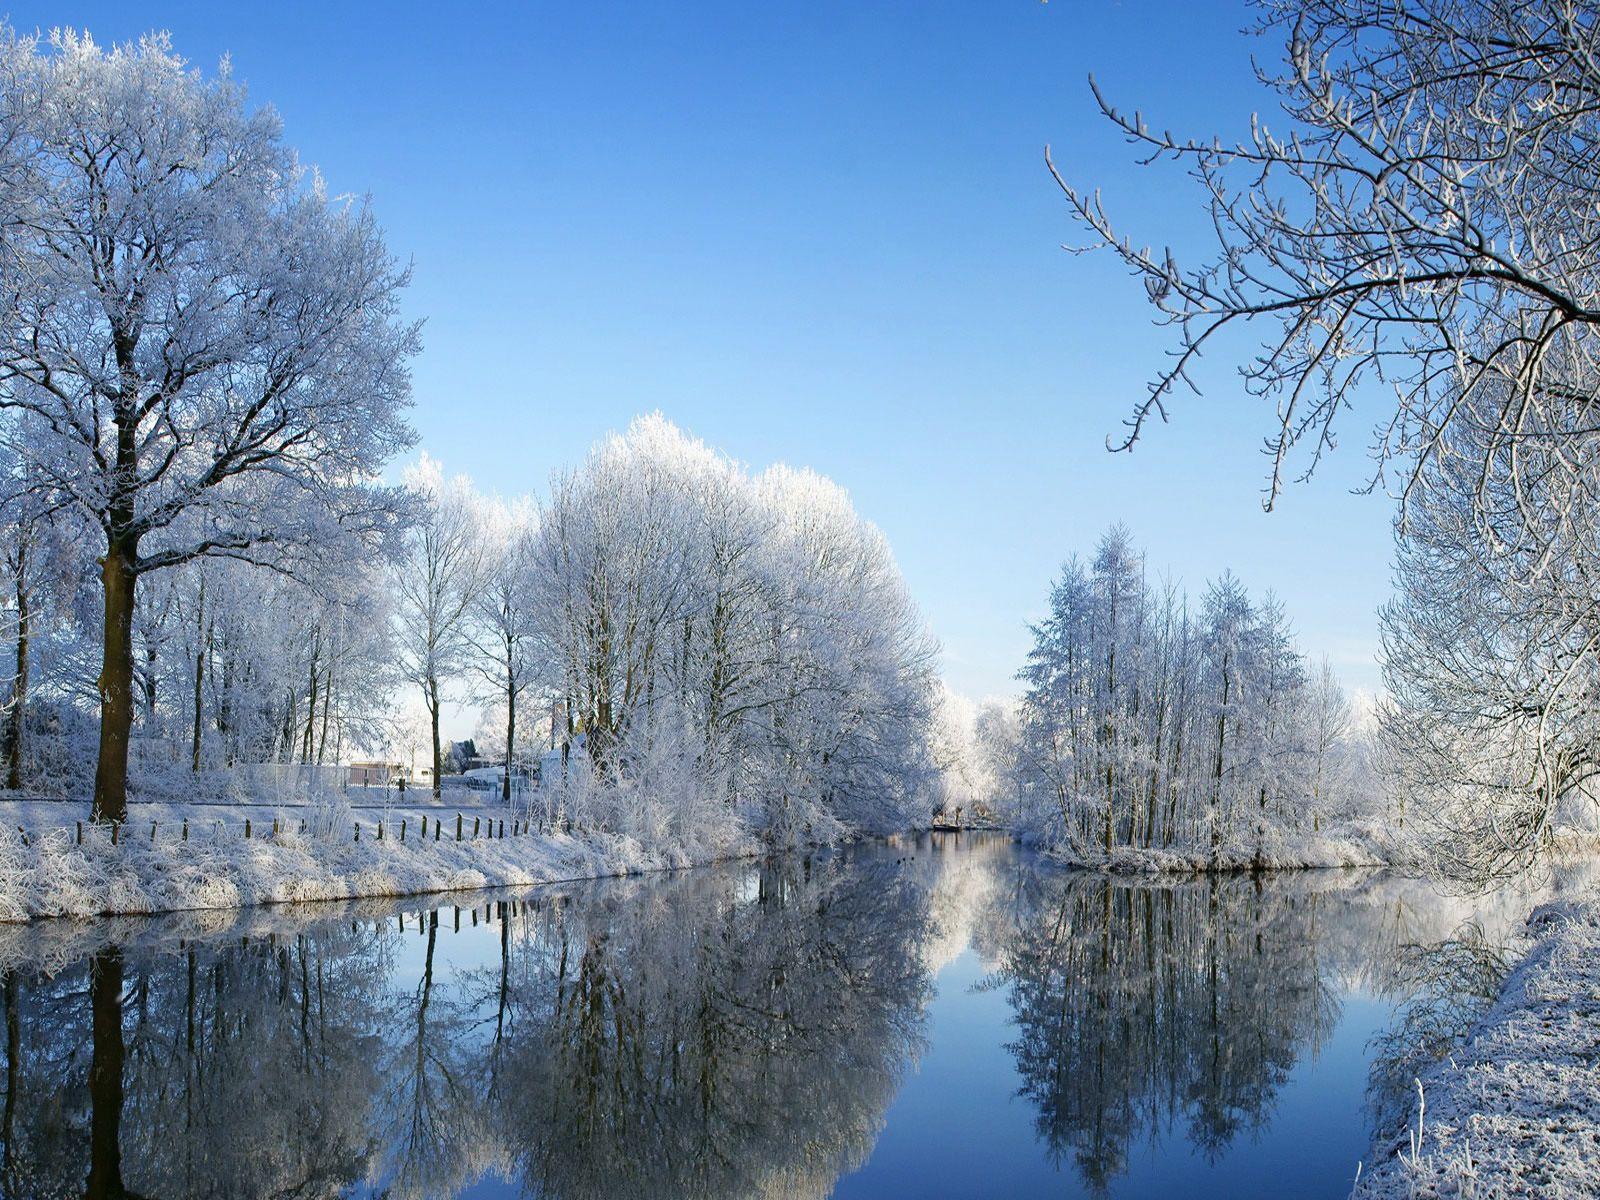 Validation/WinterFall/winter5.jpg